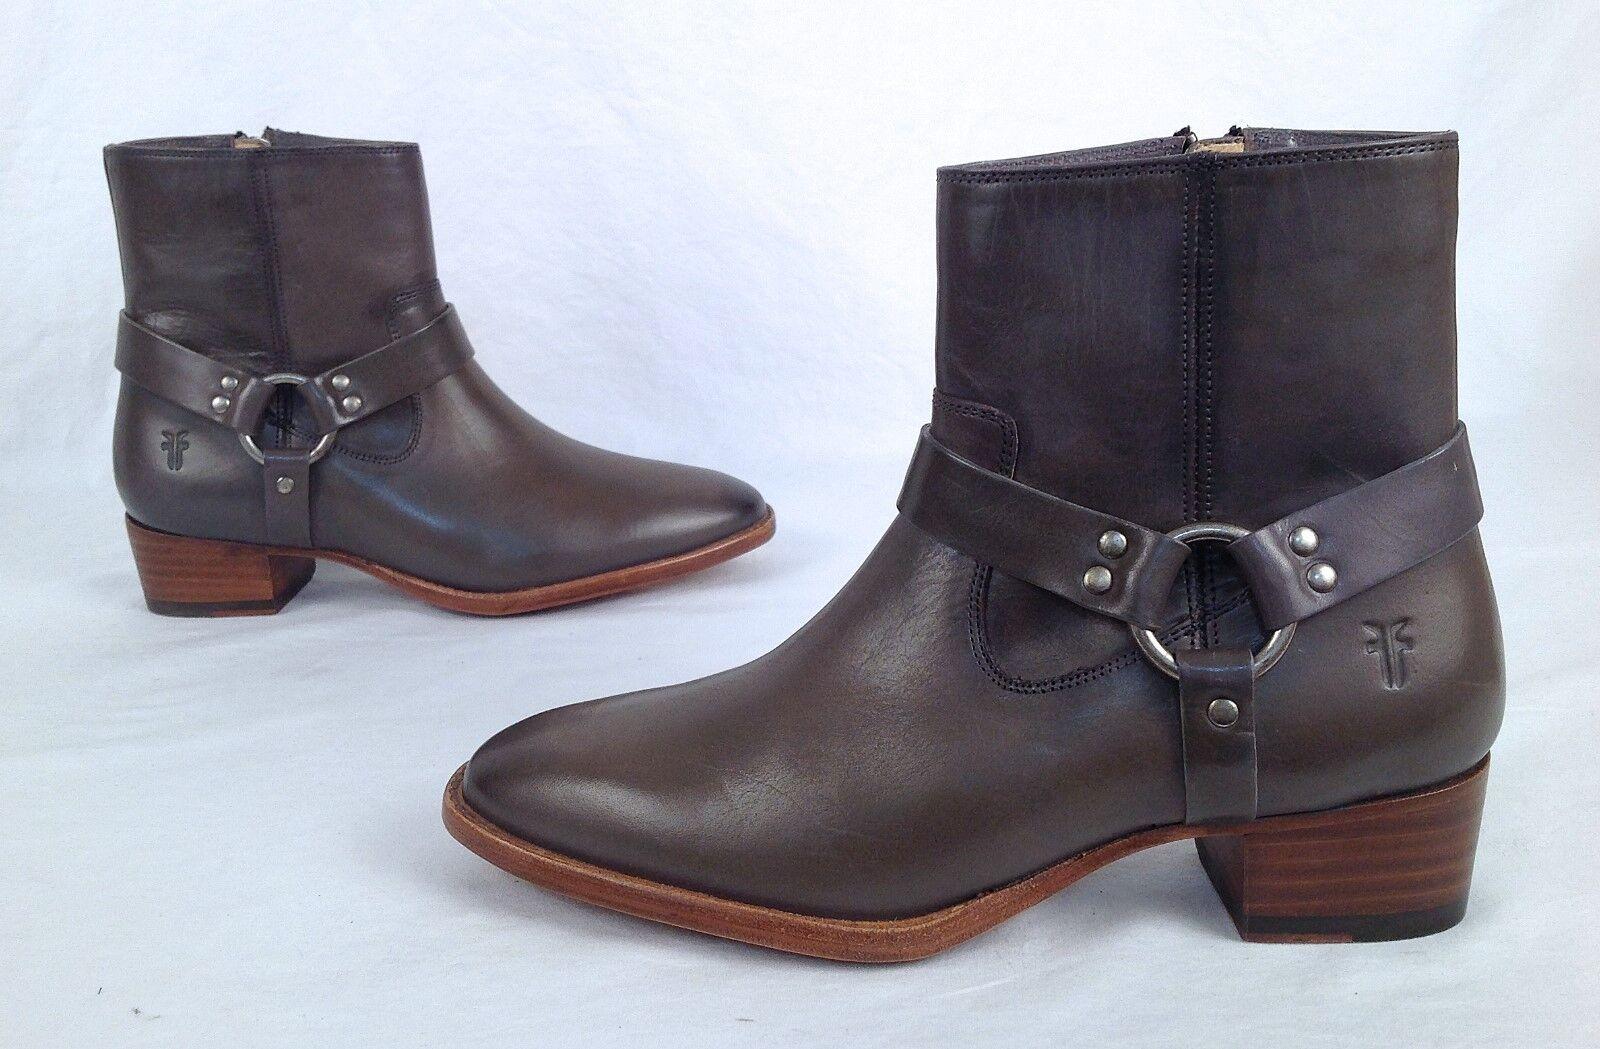 NEW   Frye 'Dara'Harness Bootie-- Bootie-- Bootie-- Grey- Size 5.5 B - 368 (04) 6a16c3